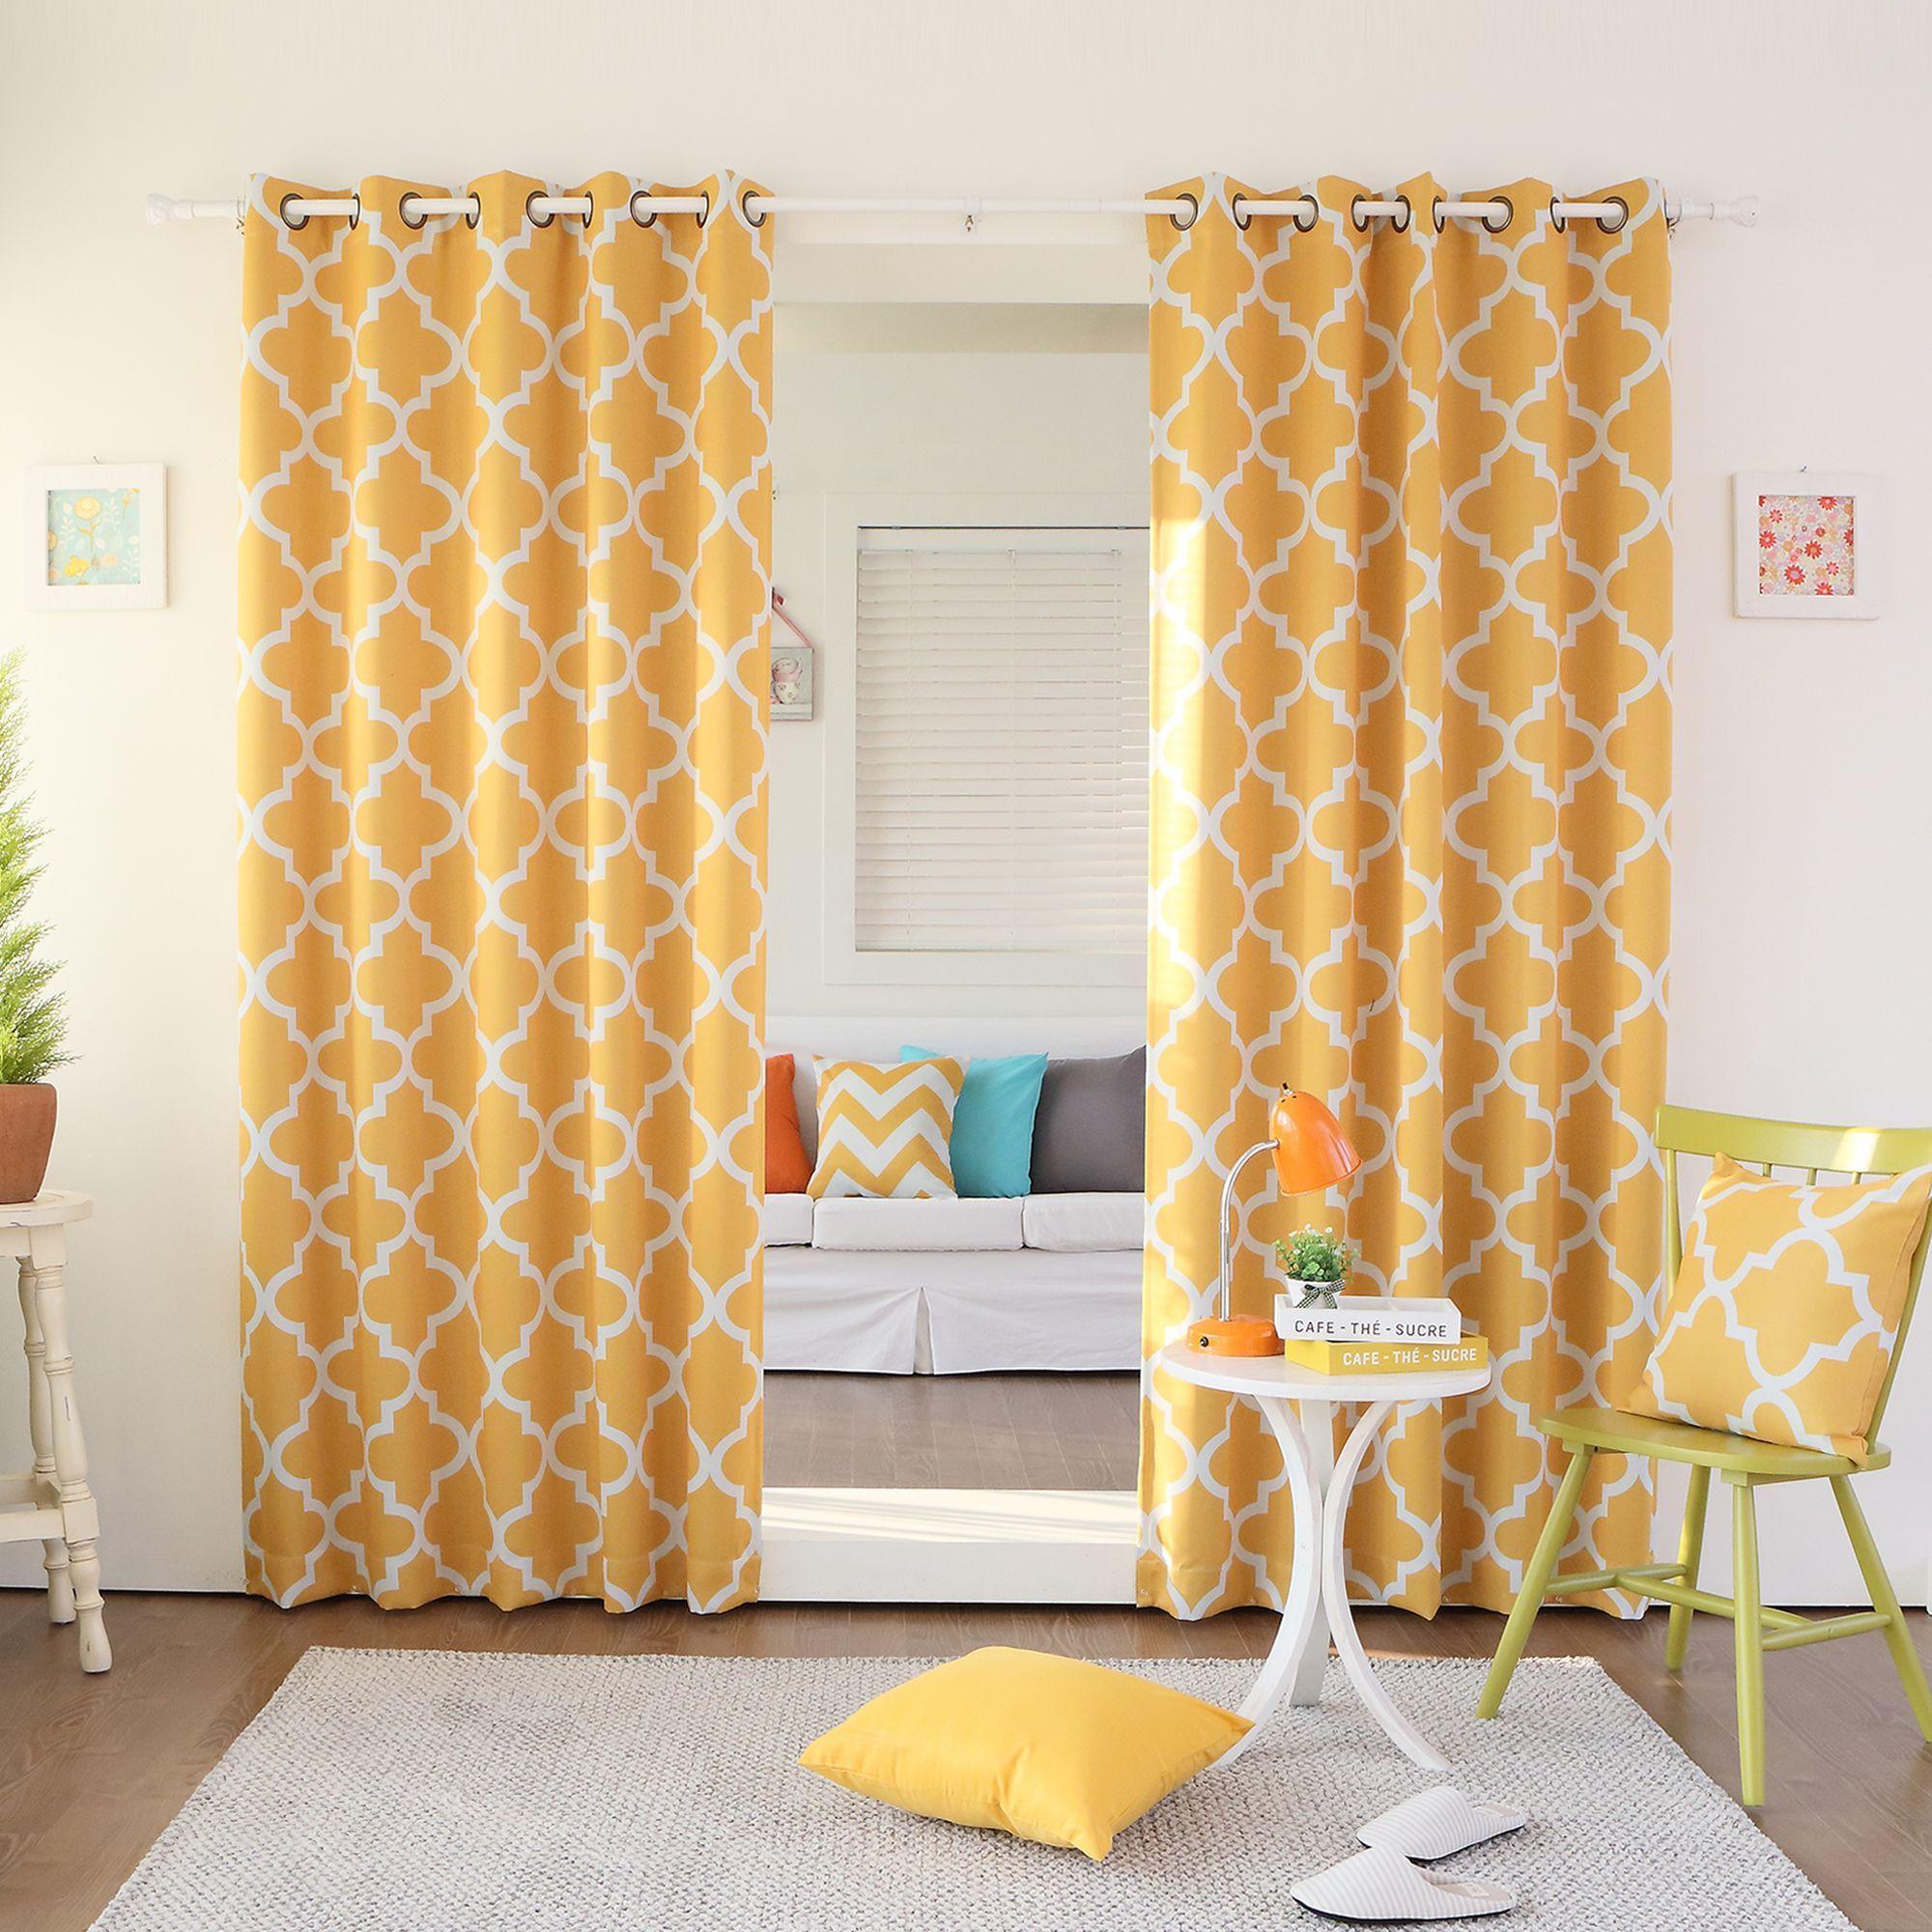 Aurora Home Moroccan Tile 96 Inch Room Darkening Curtain Panel